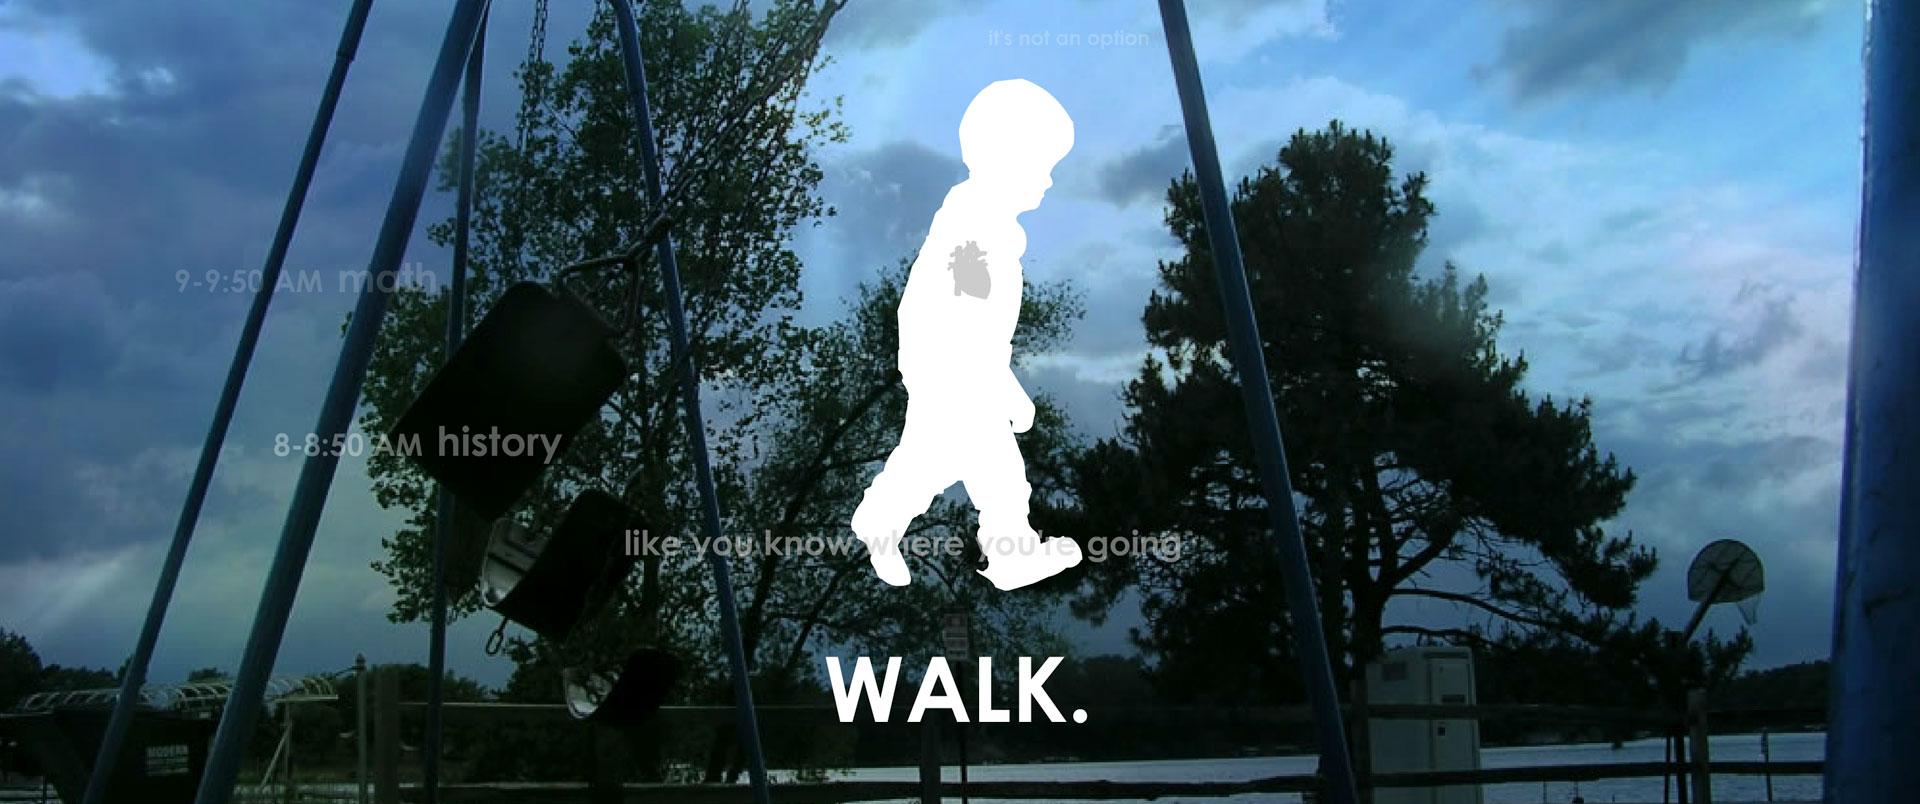 An Umbrella - Walk